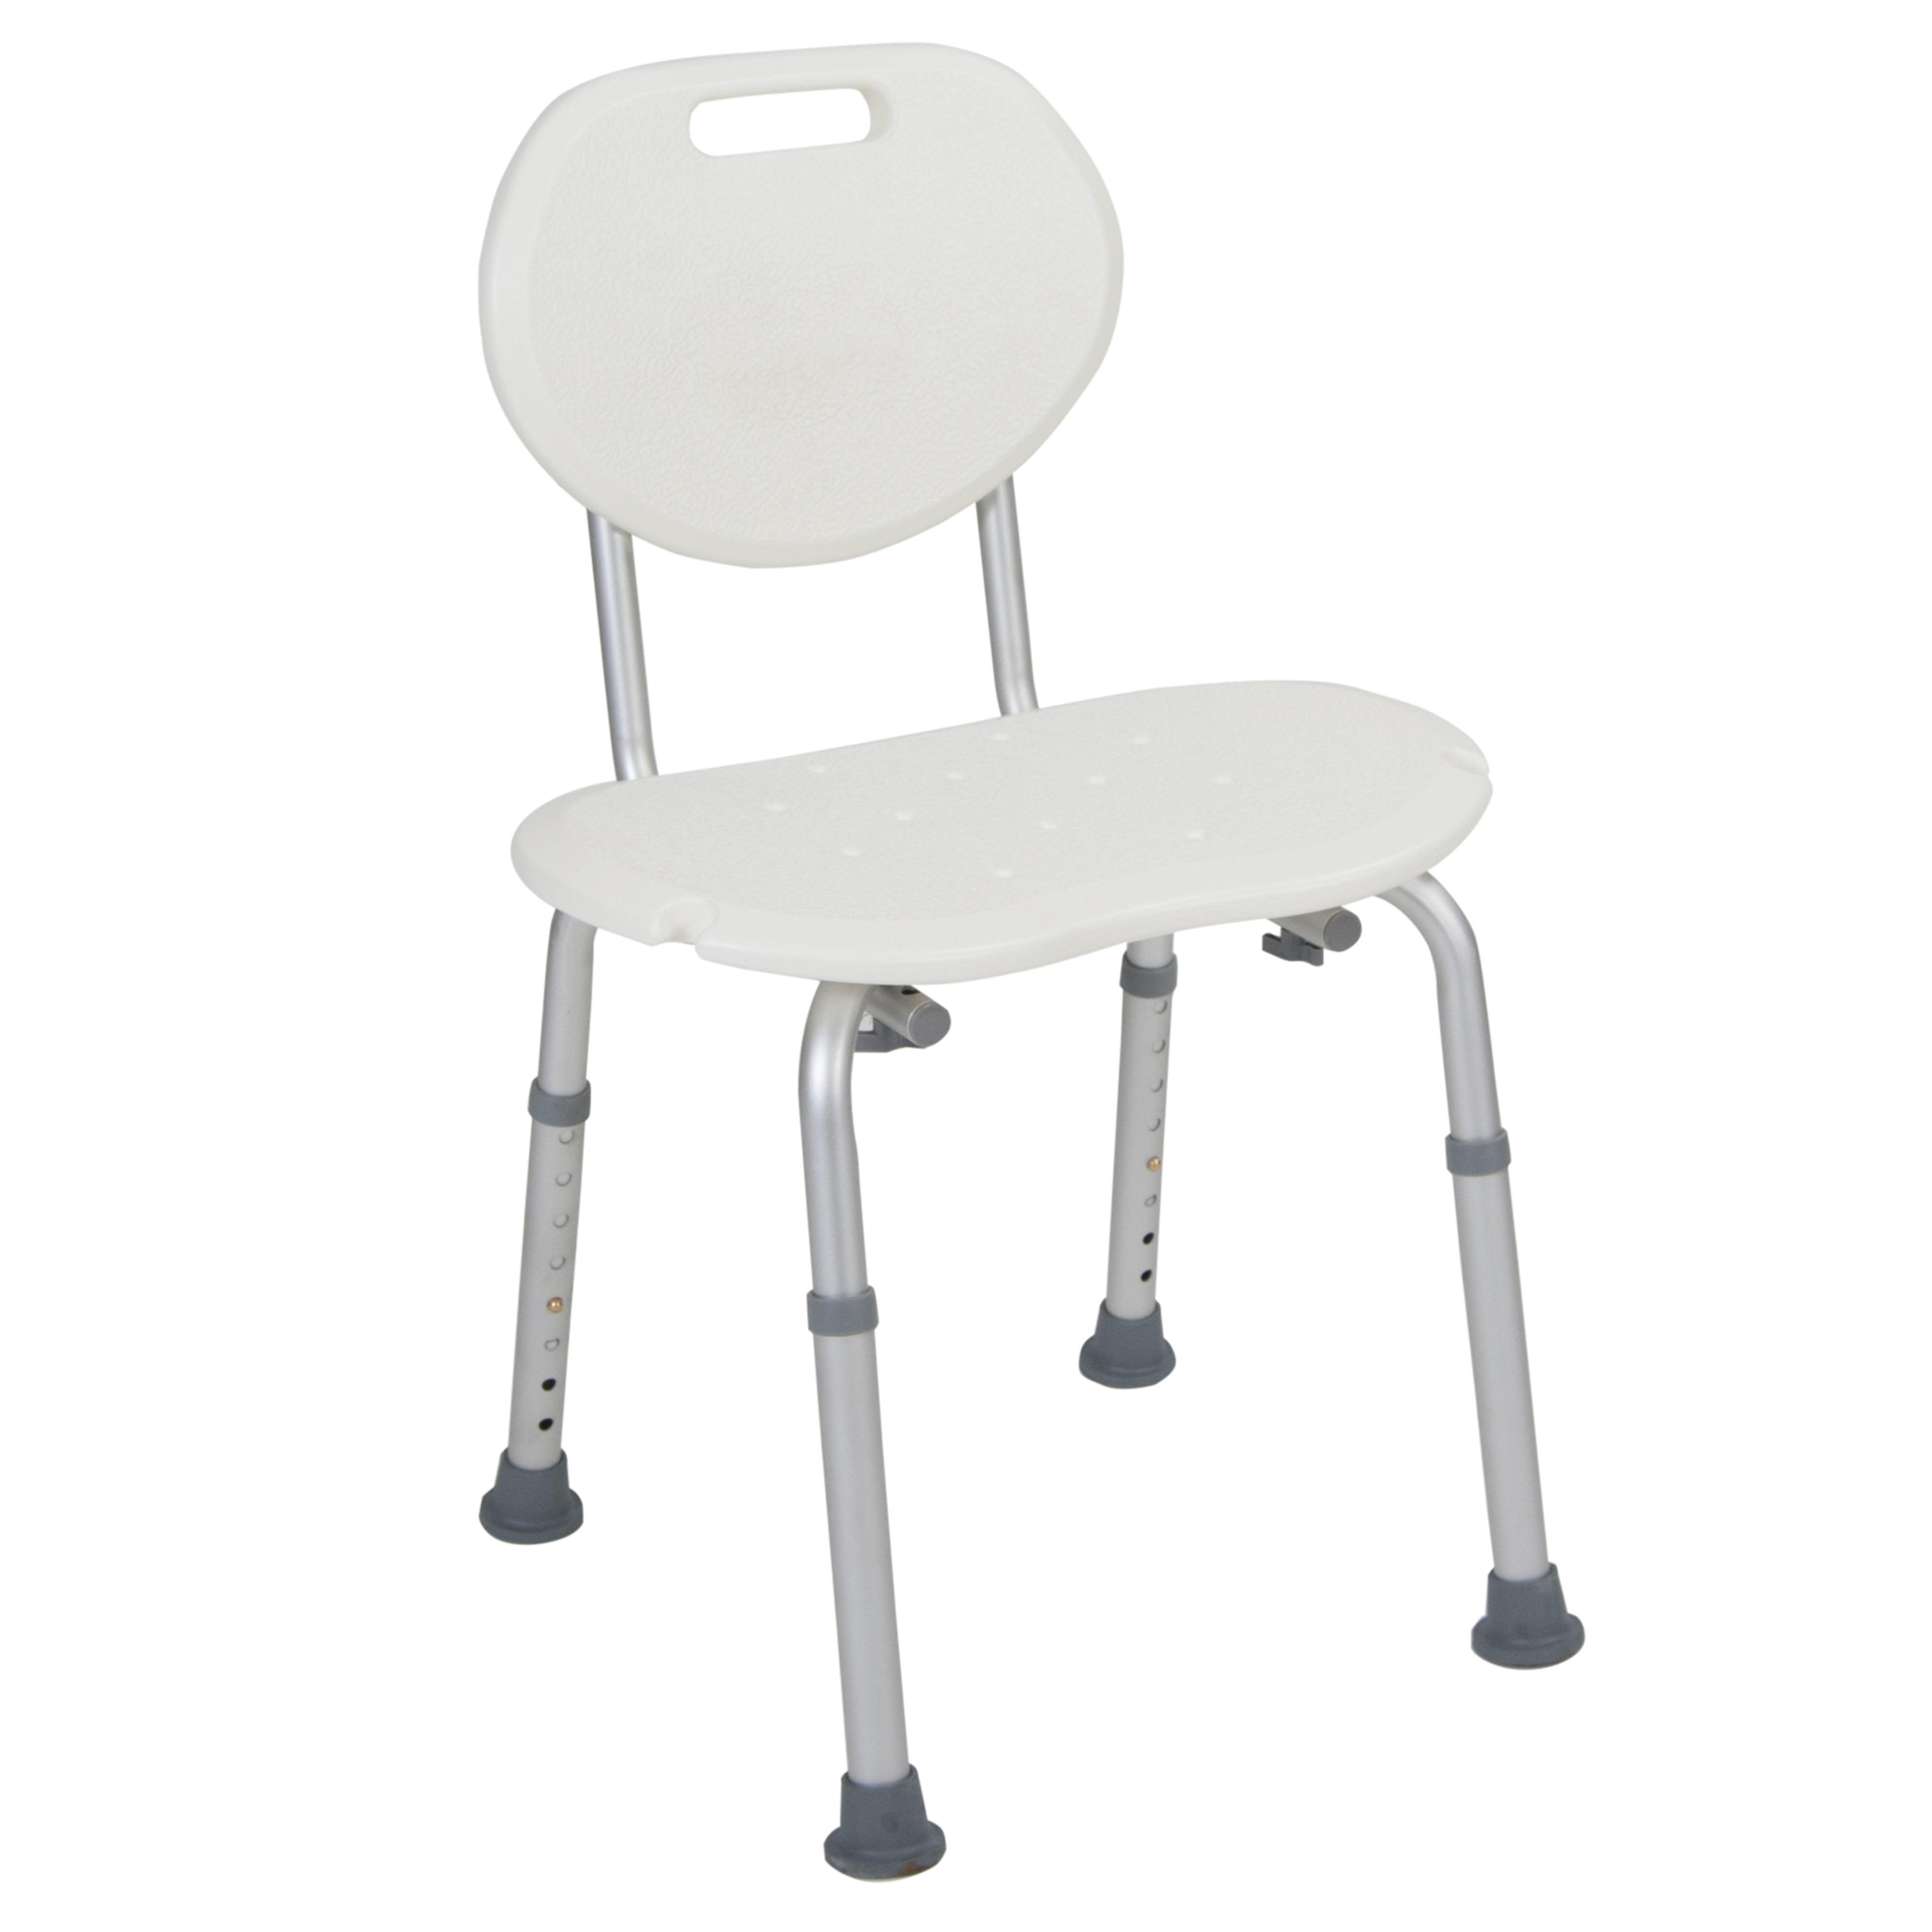 Drive Medical Bath Seat with Oval Back - Walmart.com